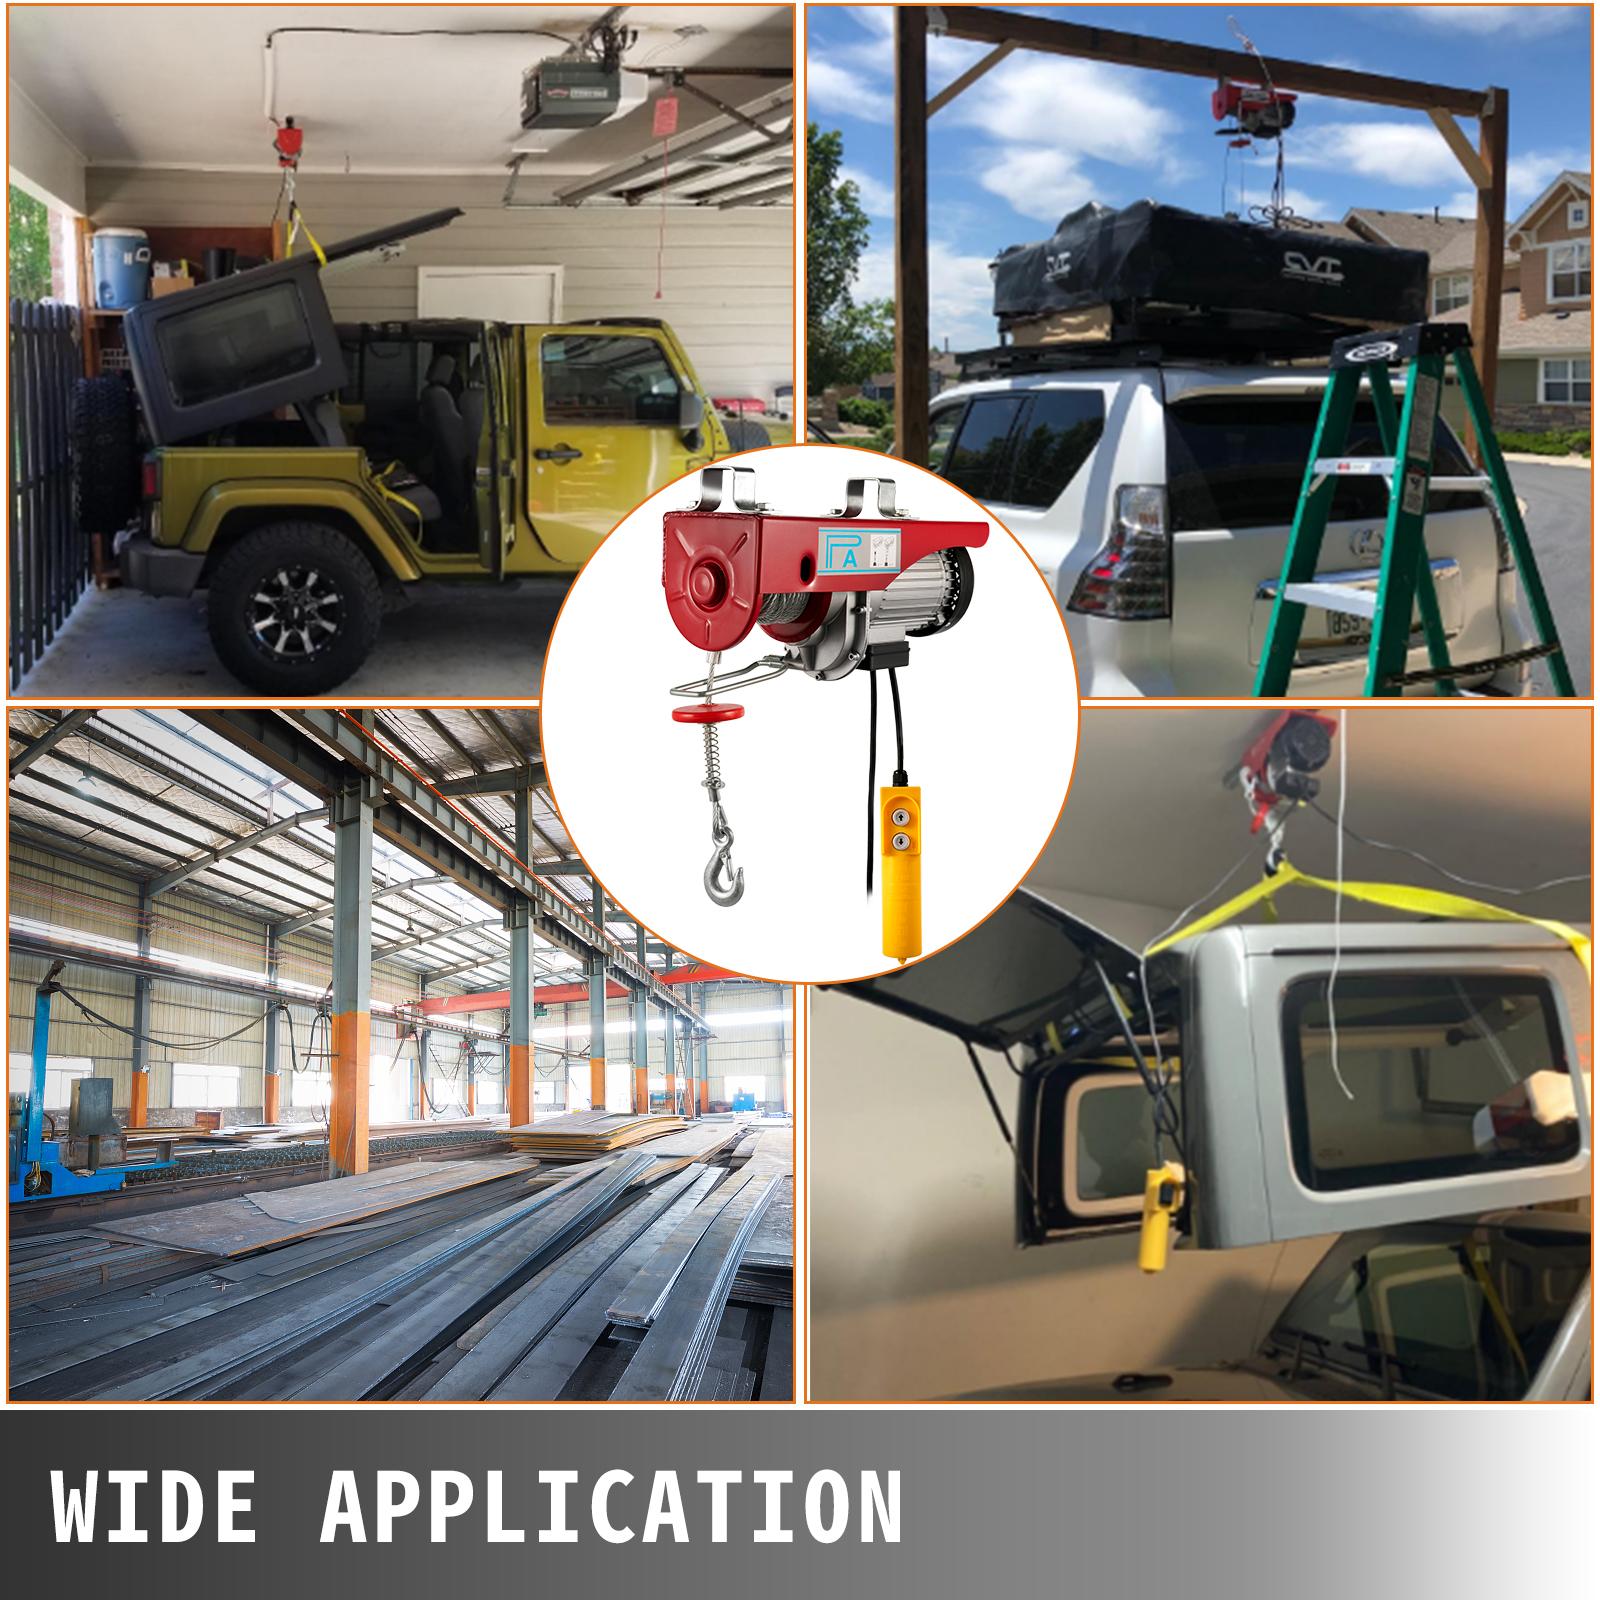 100kg-900kg-Electric-Hoist-Winch-Lifting-Engine-Crane-Cable-Lift-Hook-Garage miniature 79